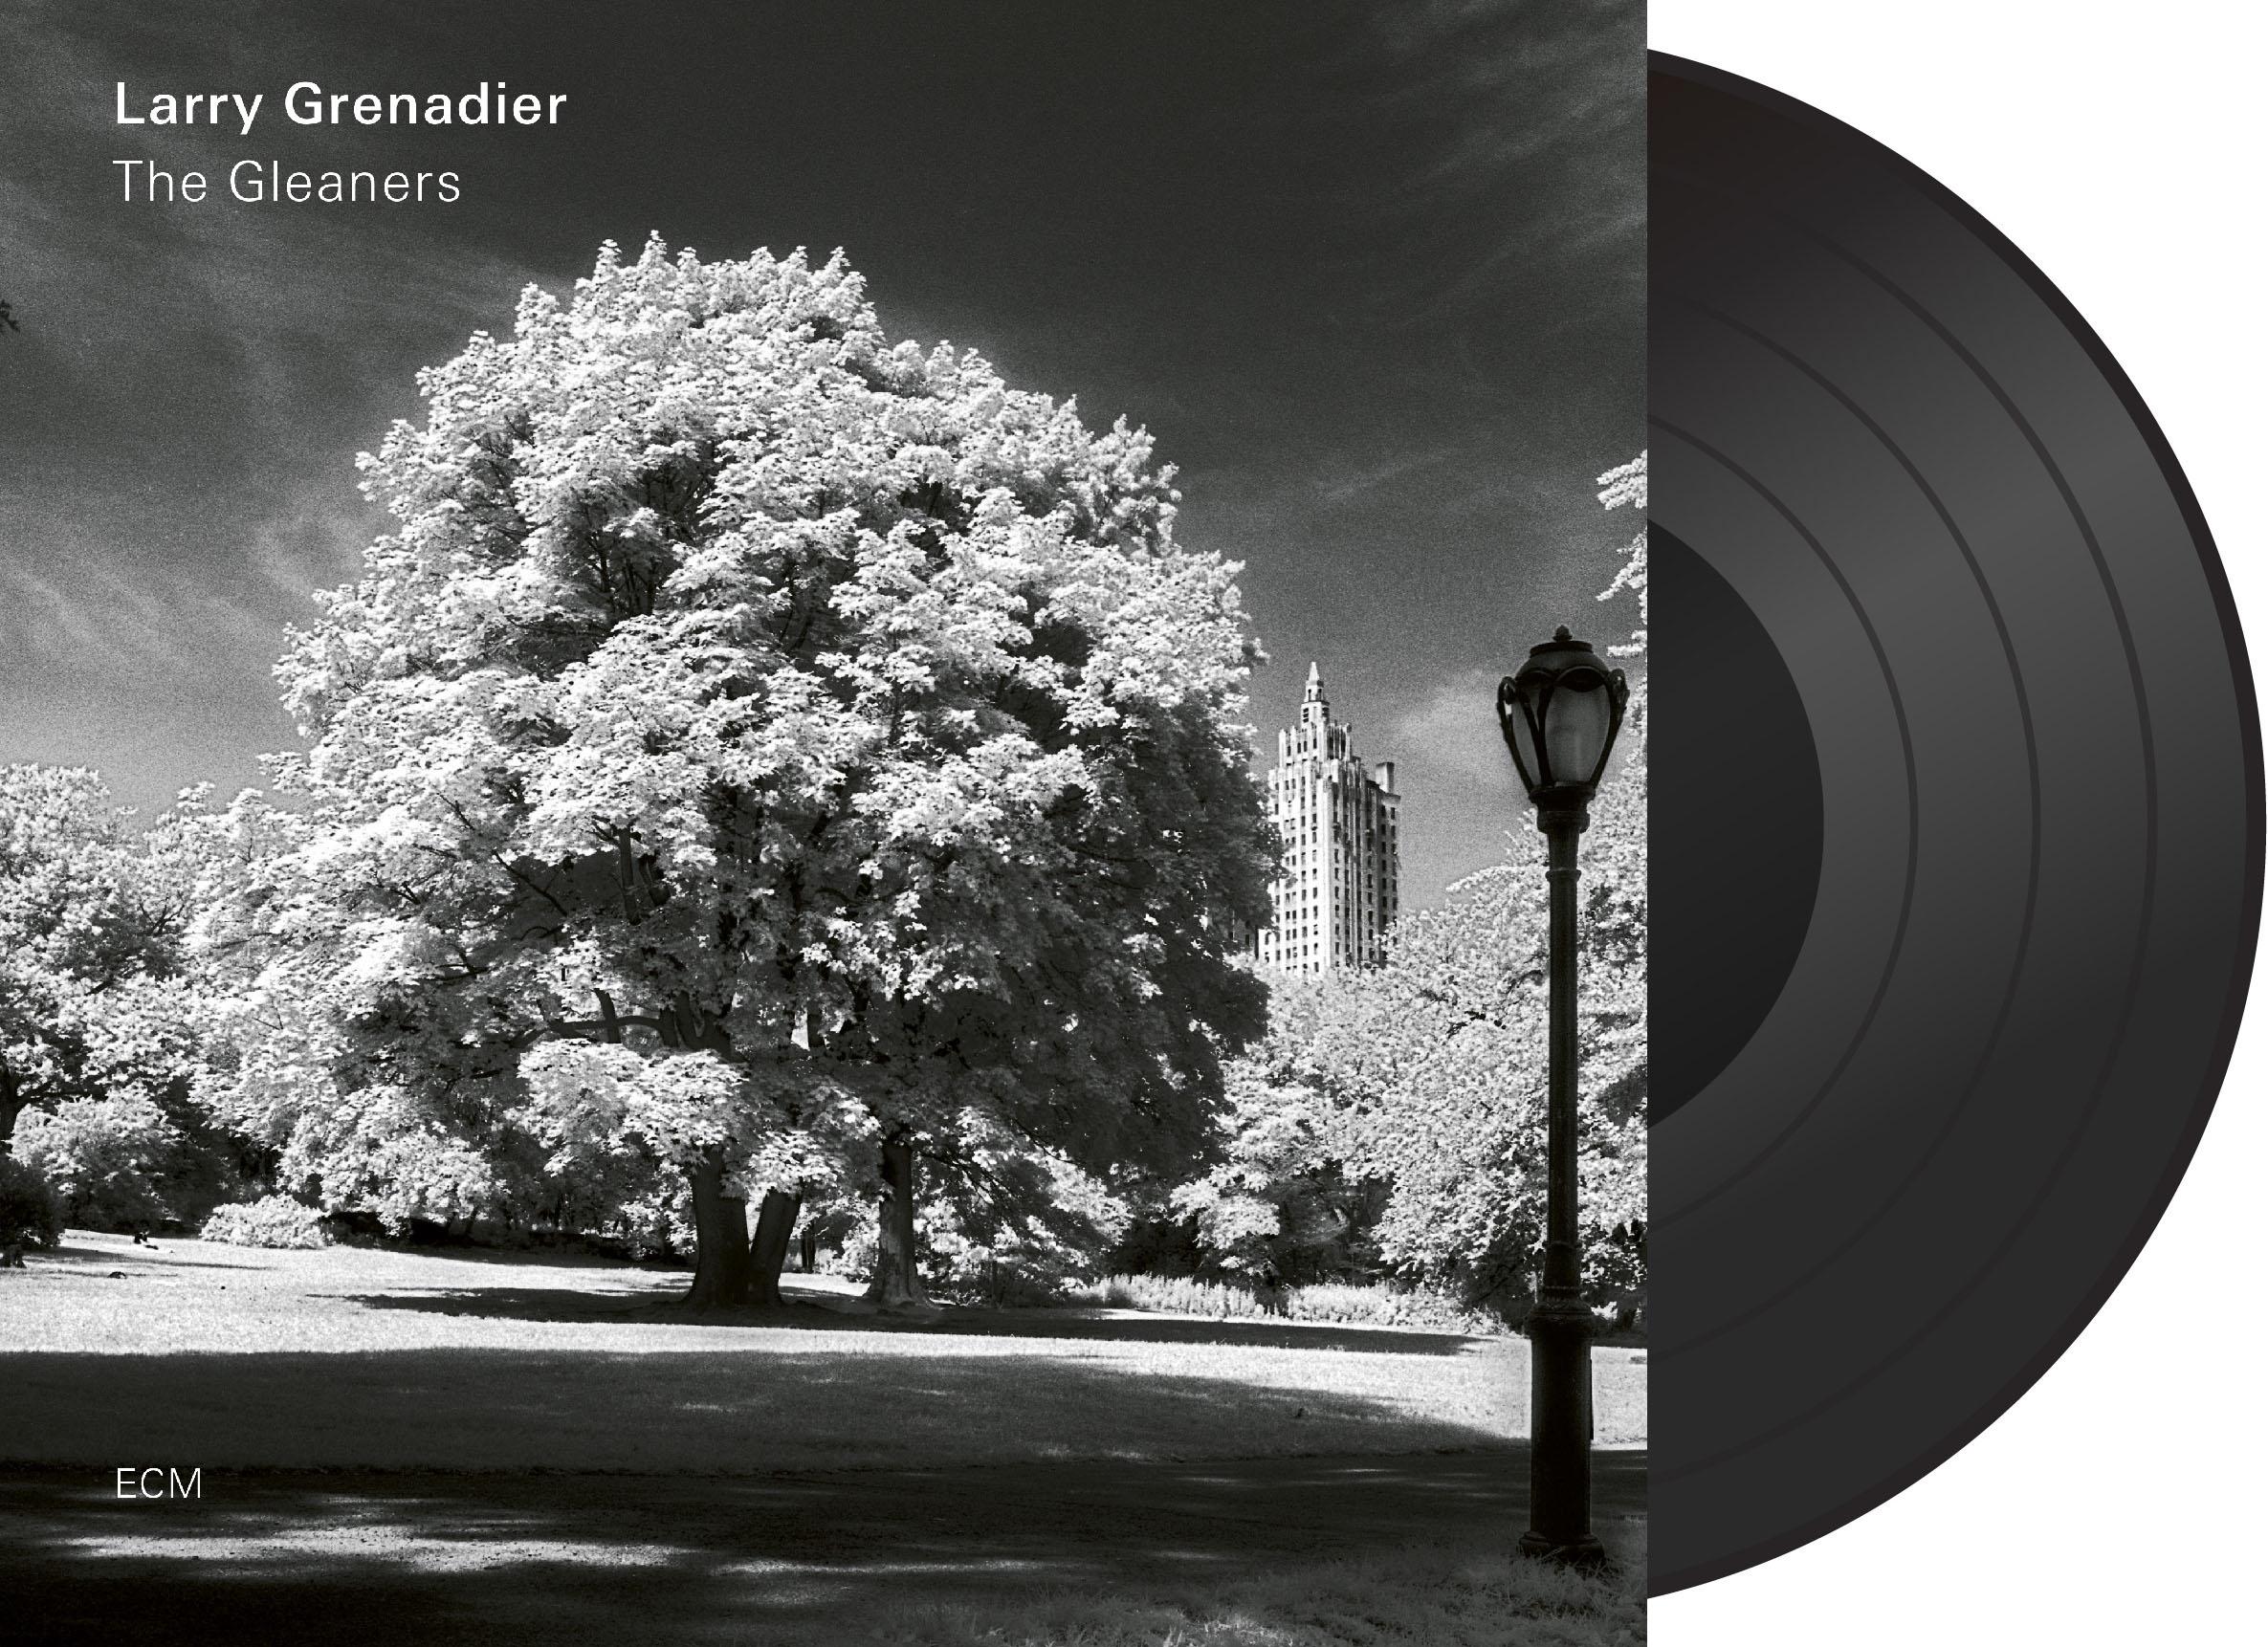 Larry Grenadier: The Gleaners (Vinyl LP) 【ECM】 1